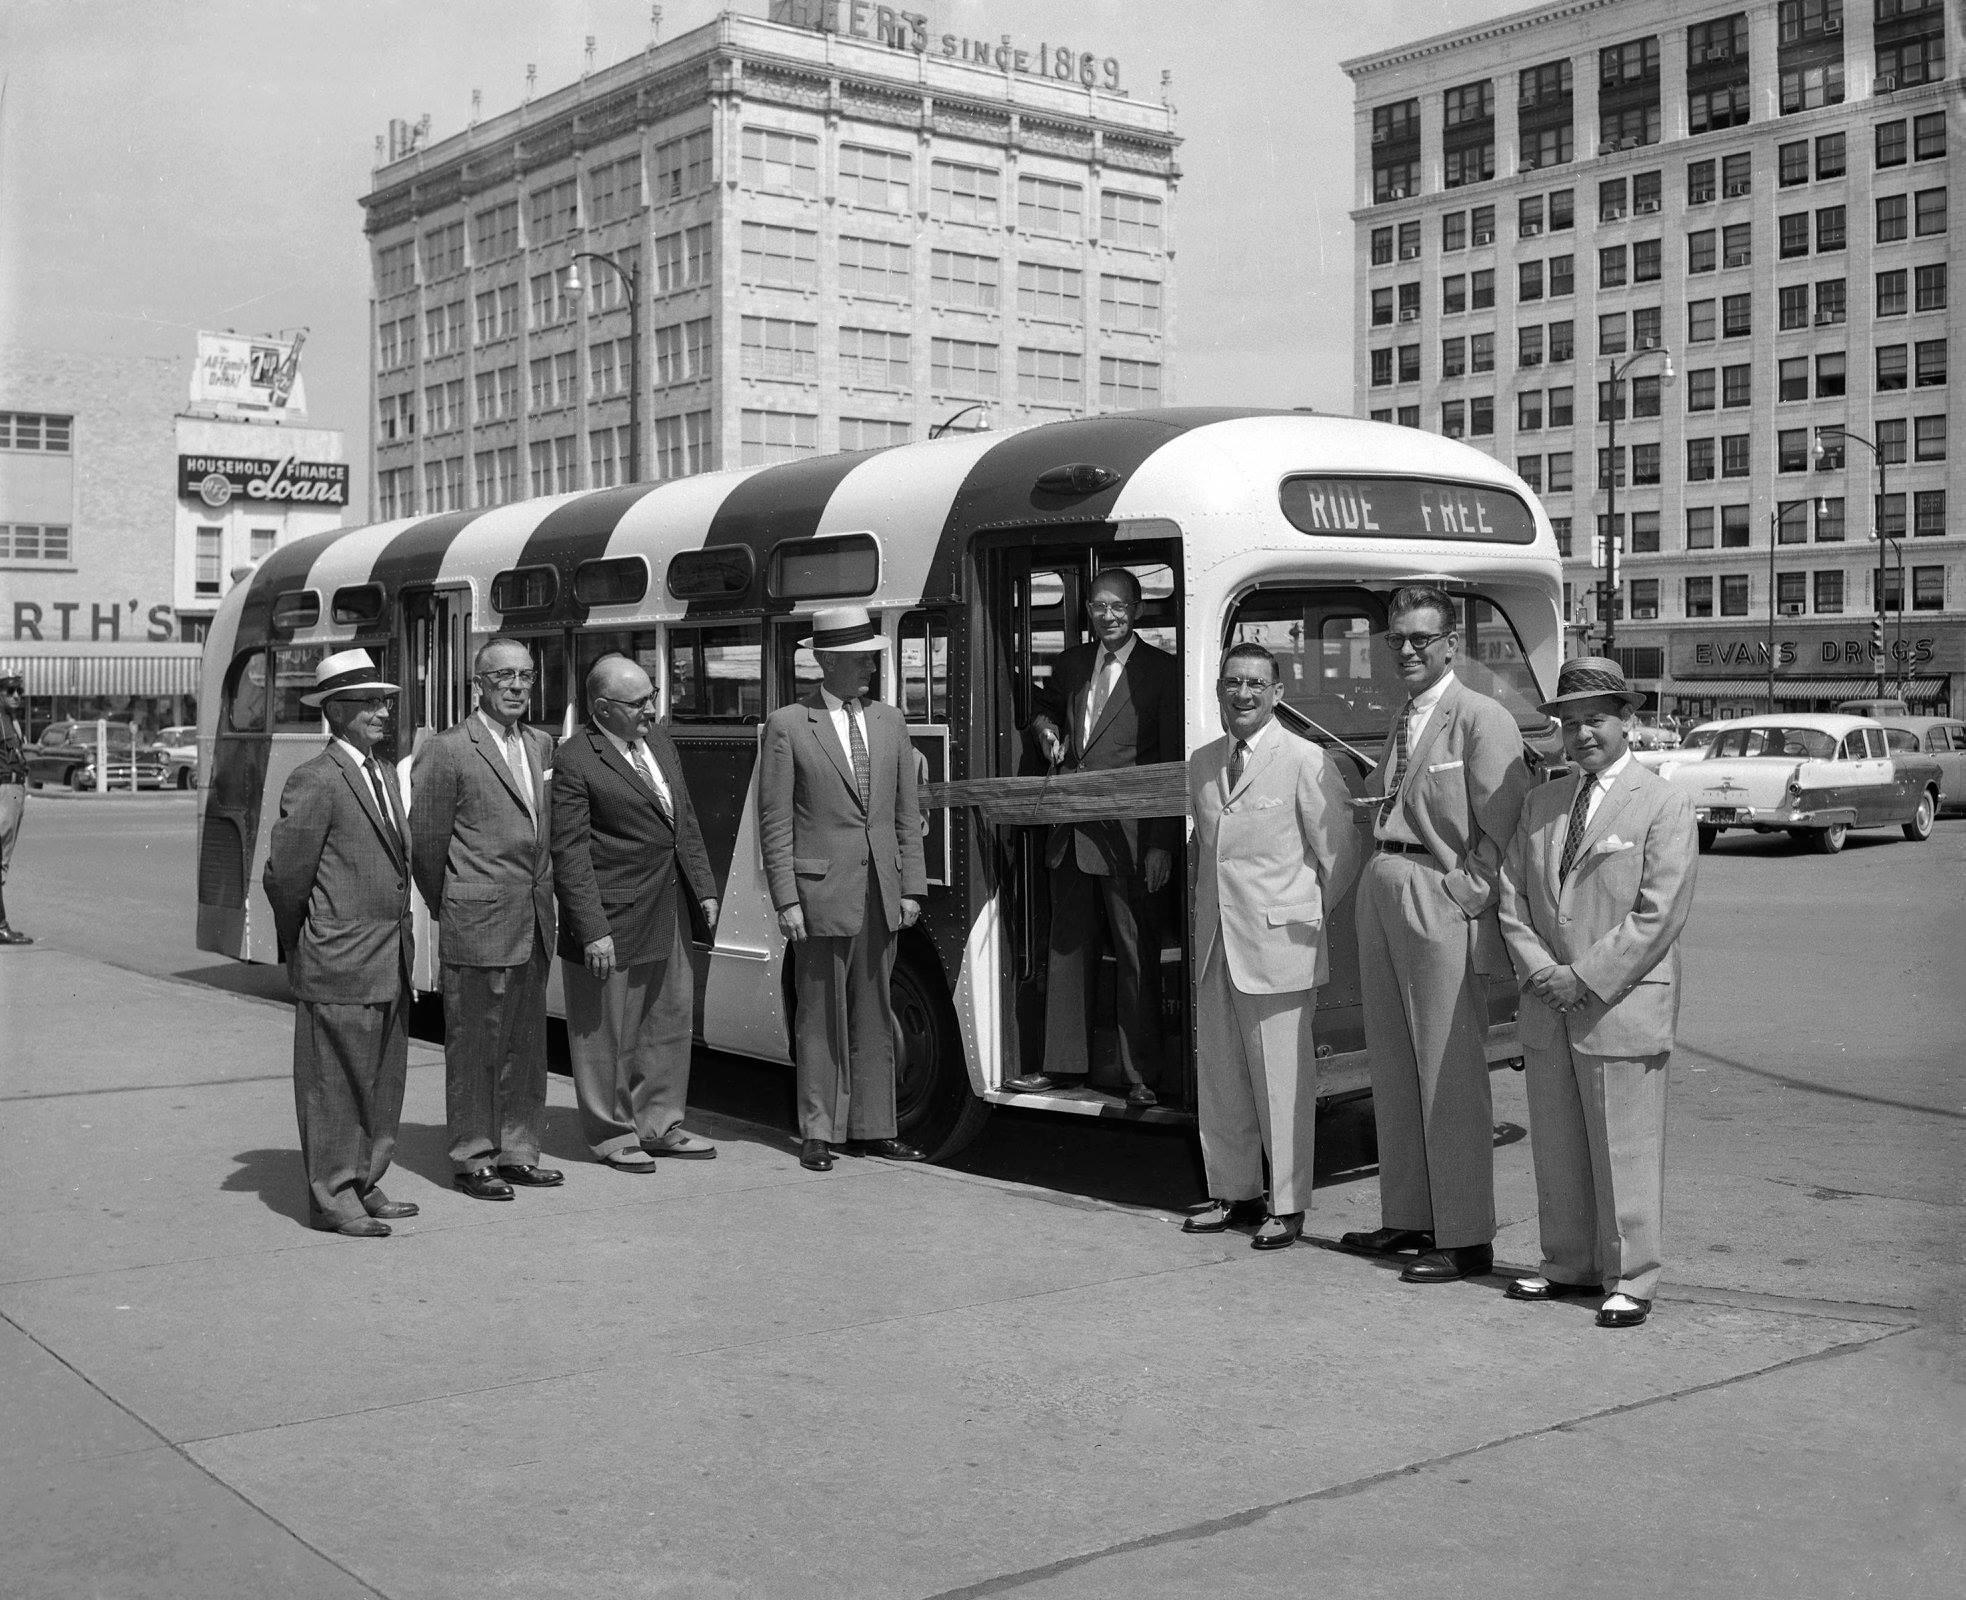 Free_Bus_1959.jpg